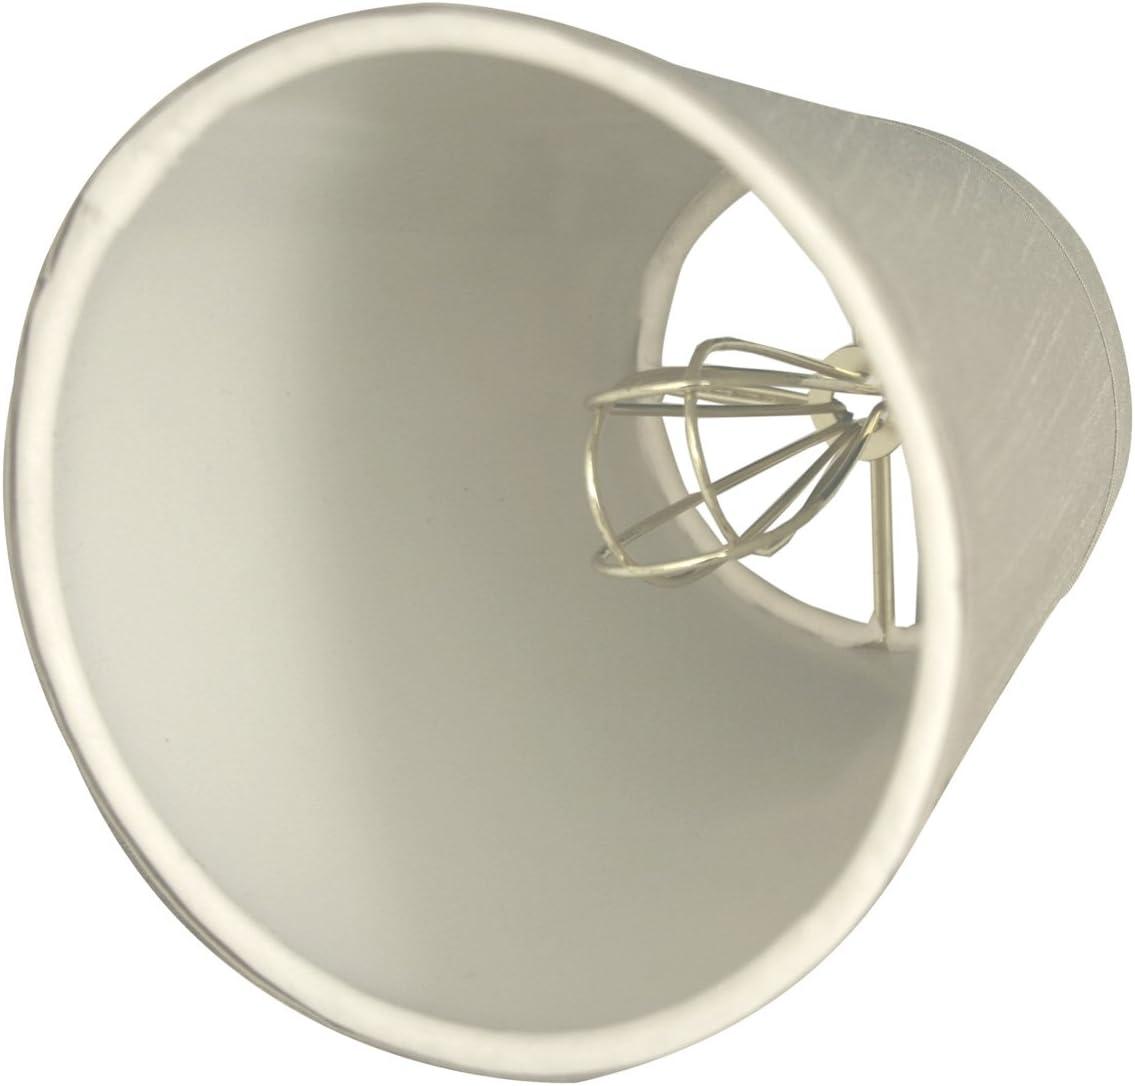 Royal Designs CS-1004-6GR-6 Clip On Empire Chandelier Lamp Shade, 4 x 6 x 5.5 , Gray, Set of 6